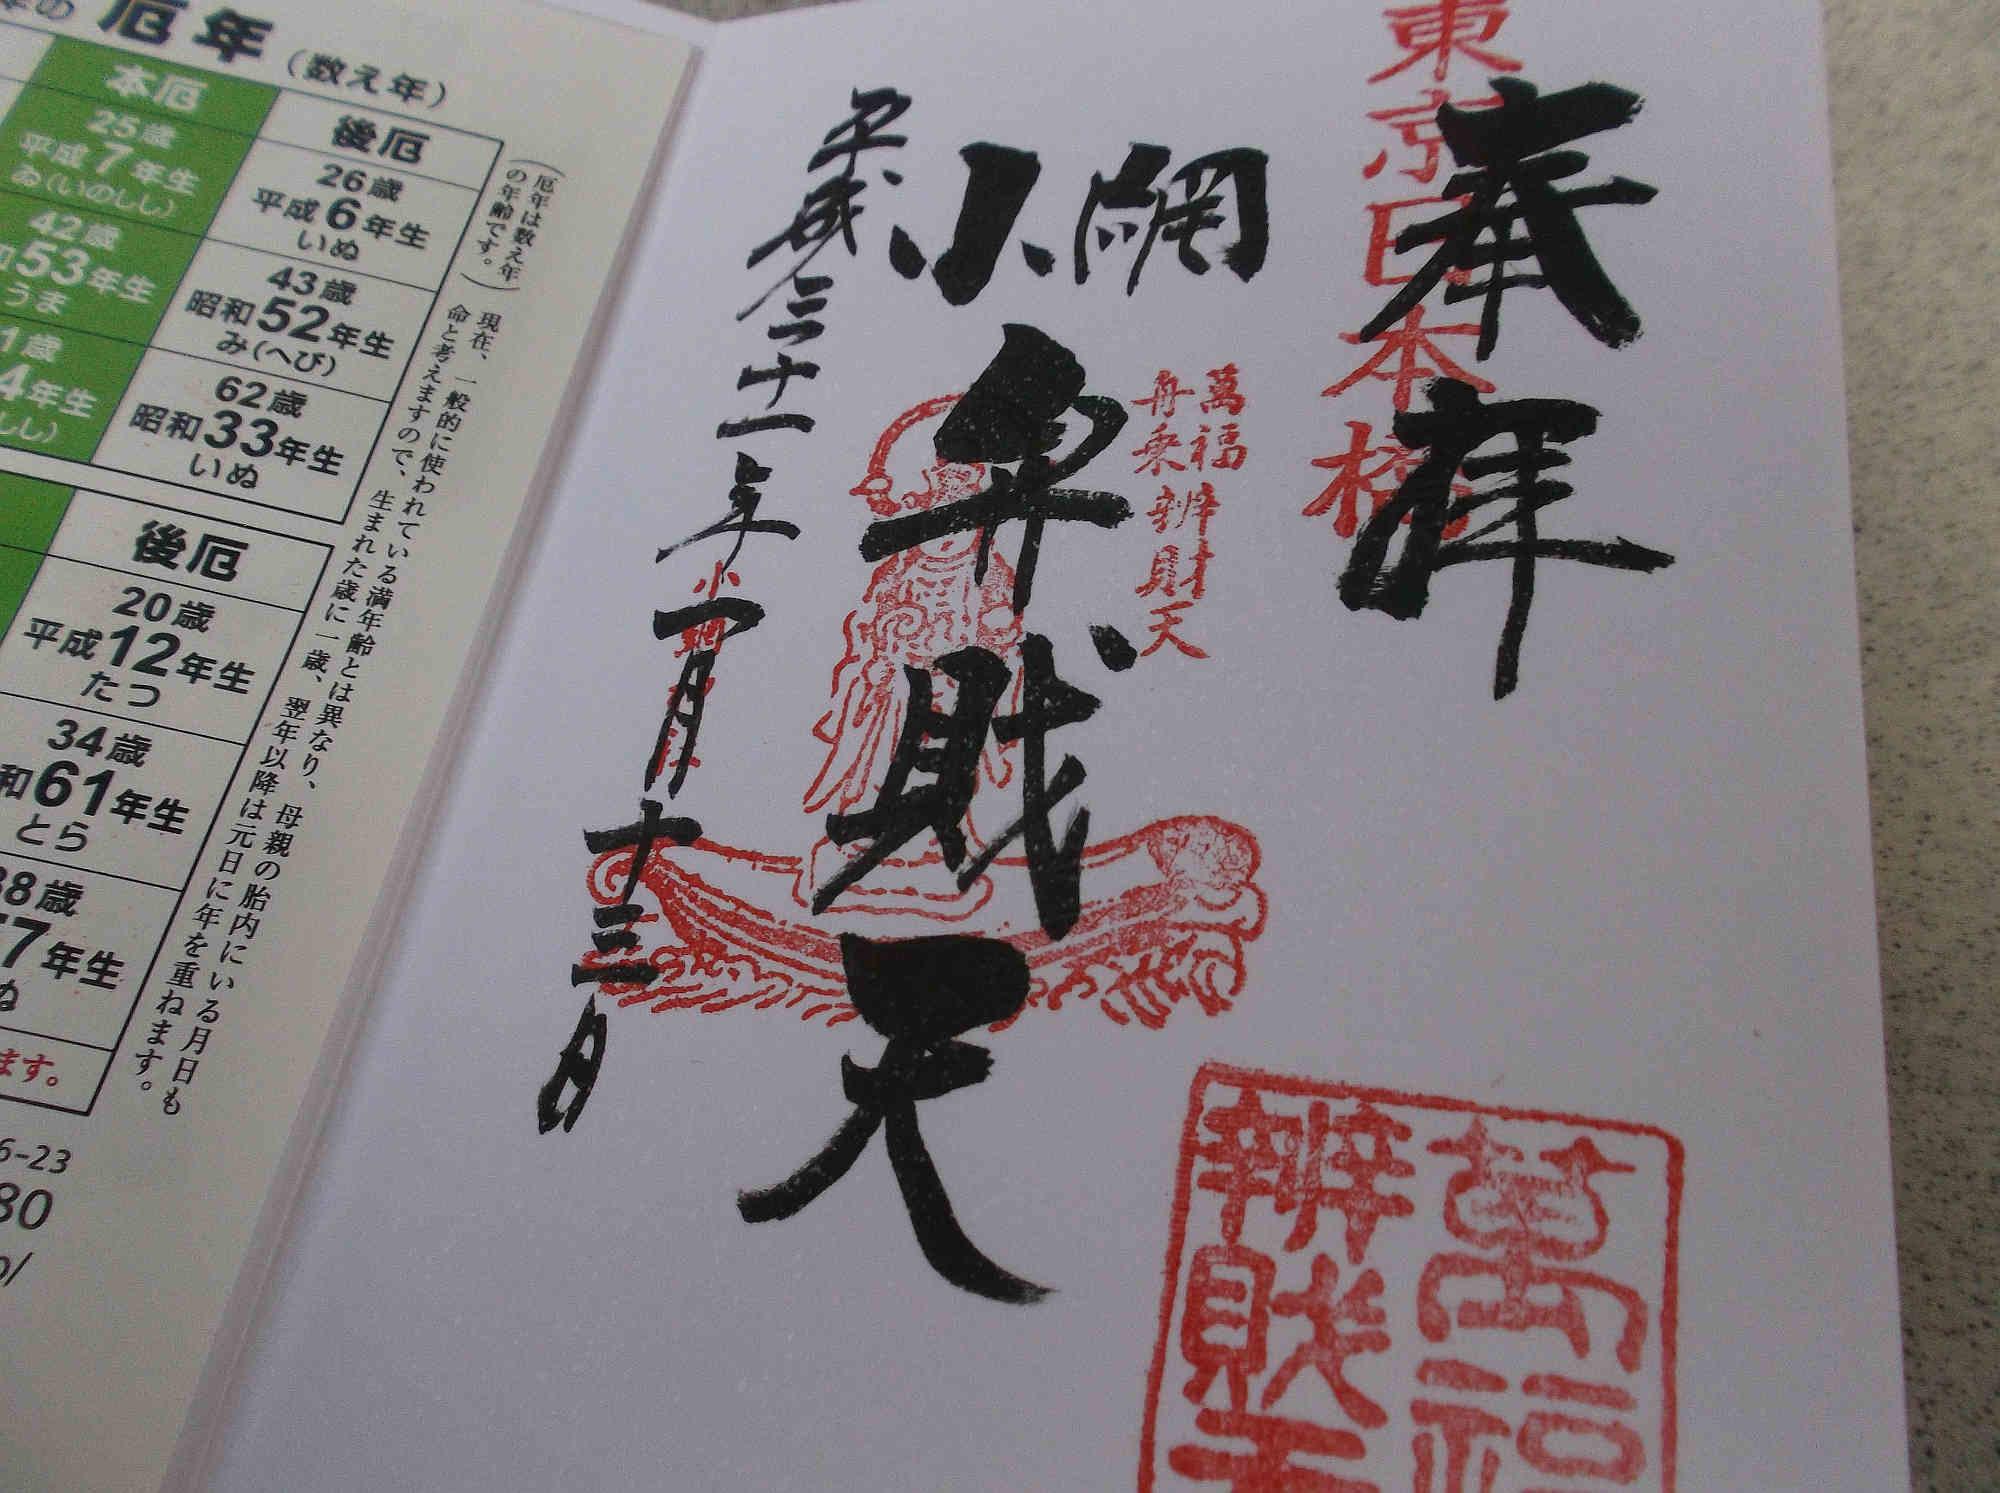 小網神社の御朱印(弁財天)